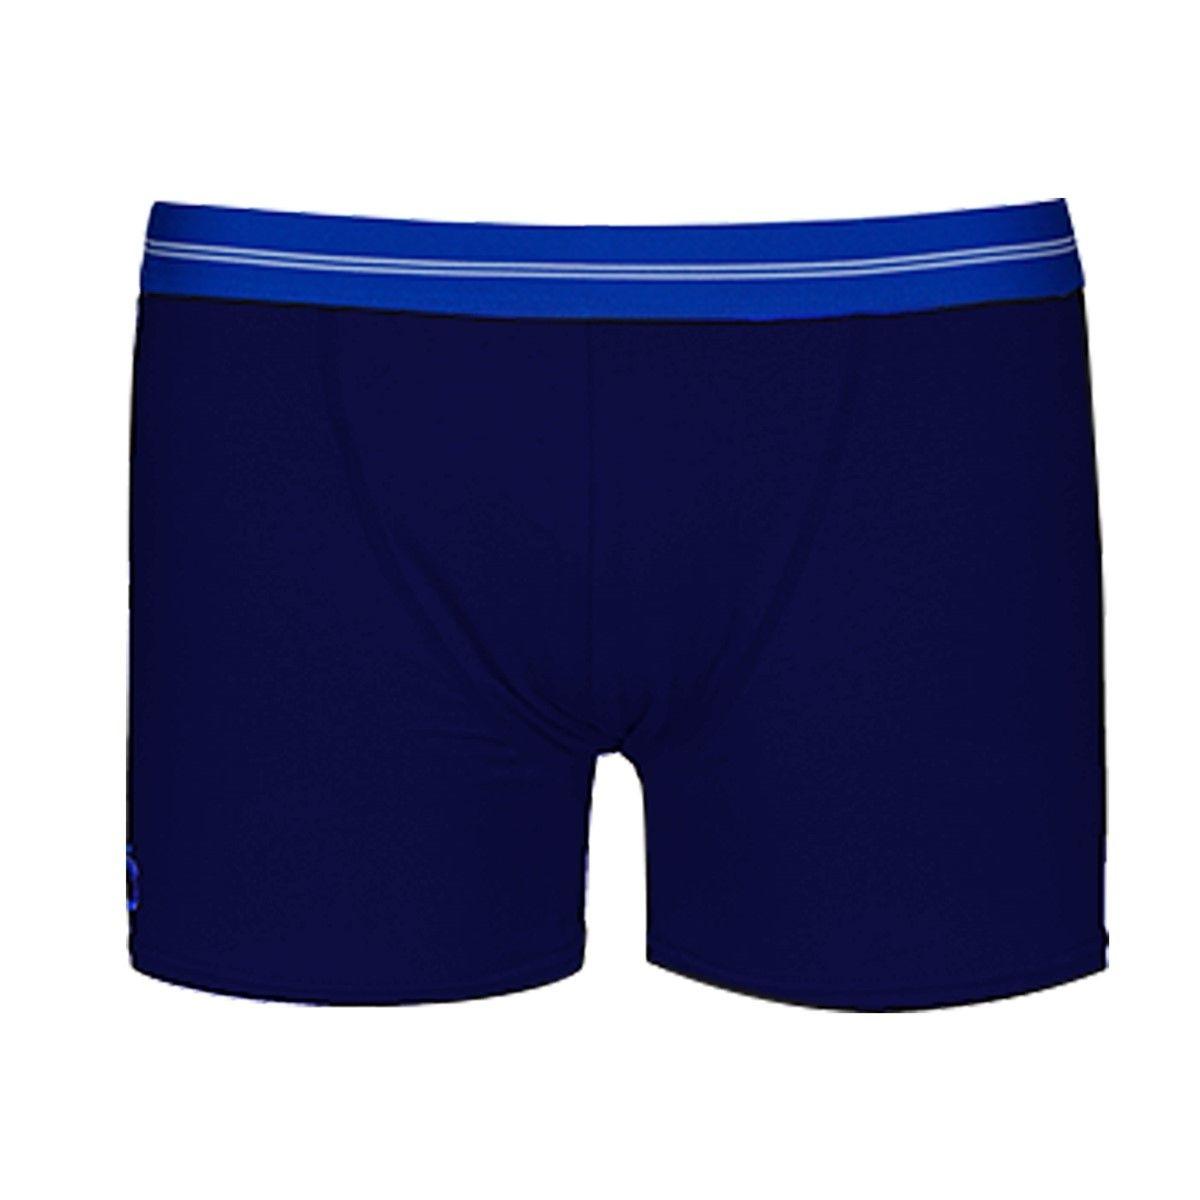 Boxer bleu marine